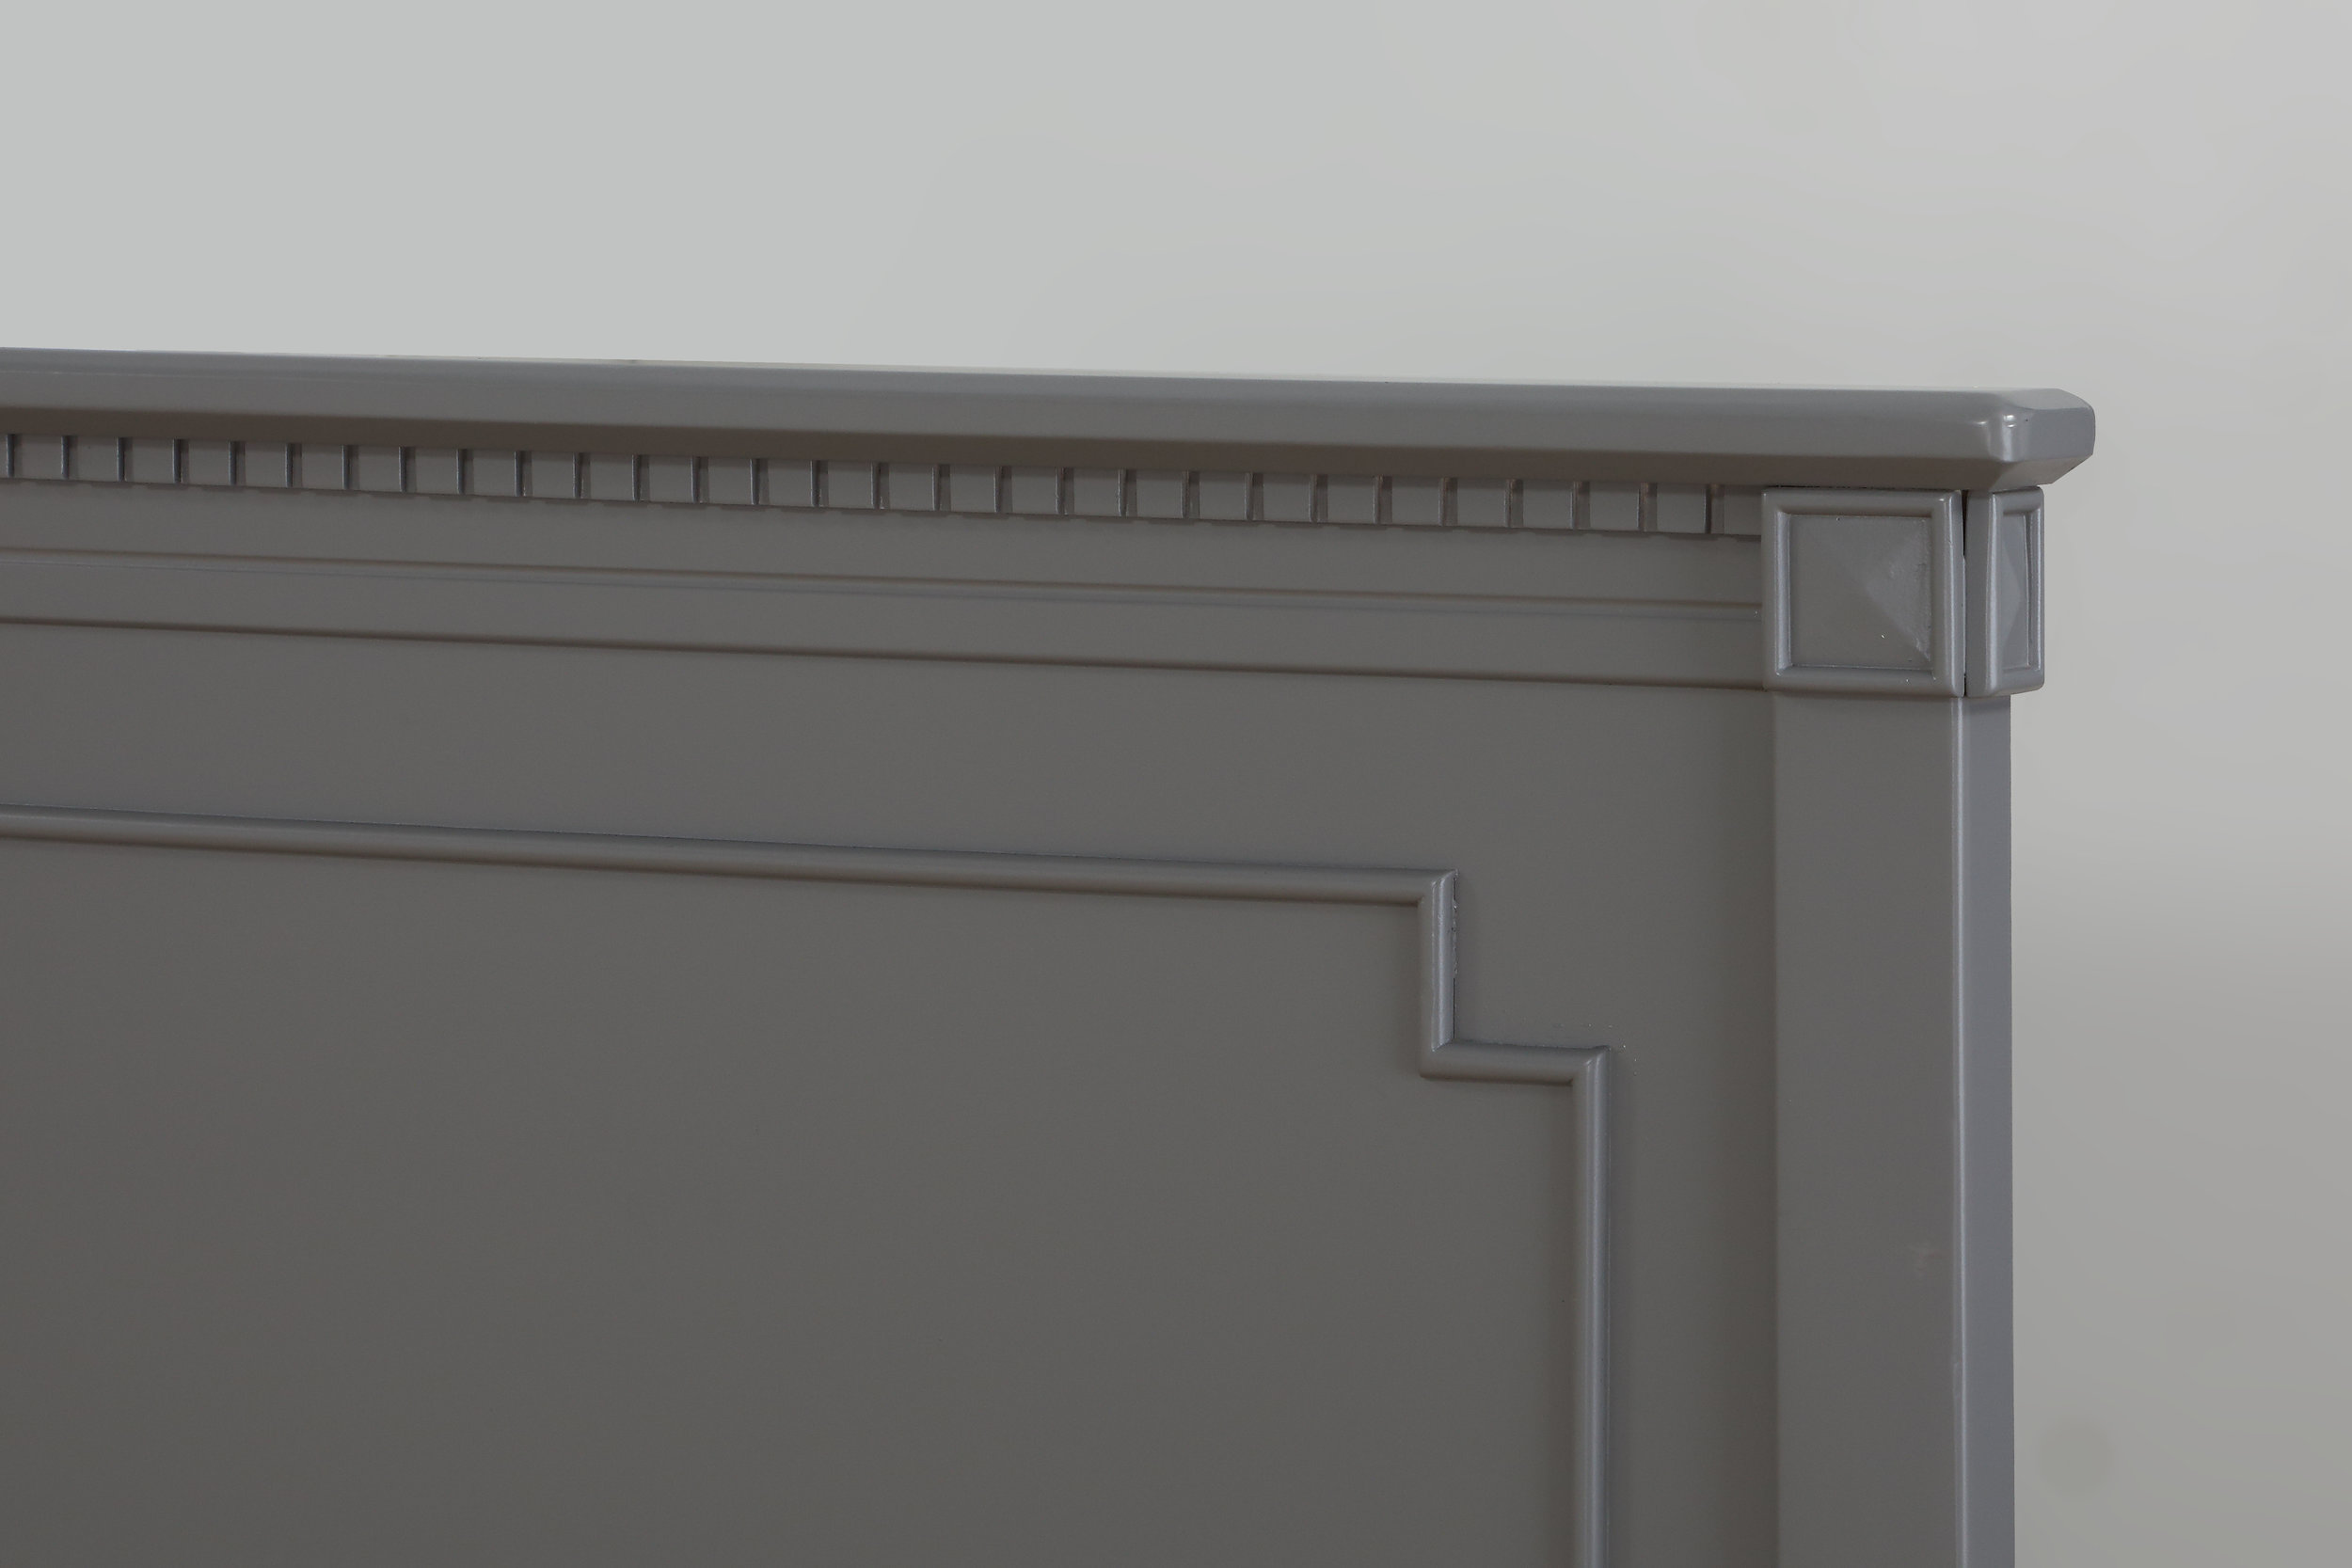 HR Belgian Crib Headboard Close Up - Pebble Grey.jpg